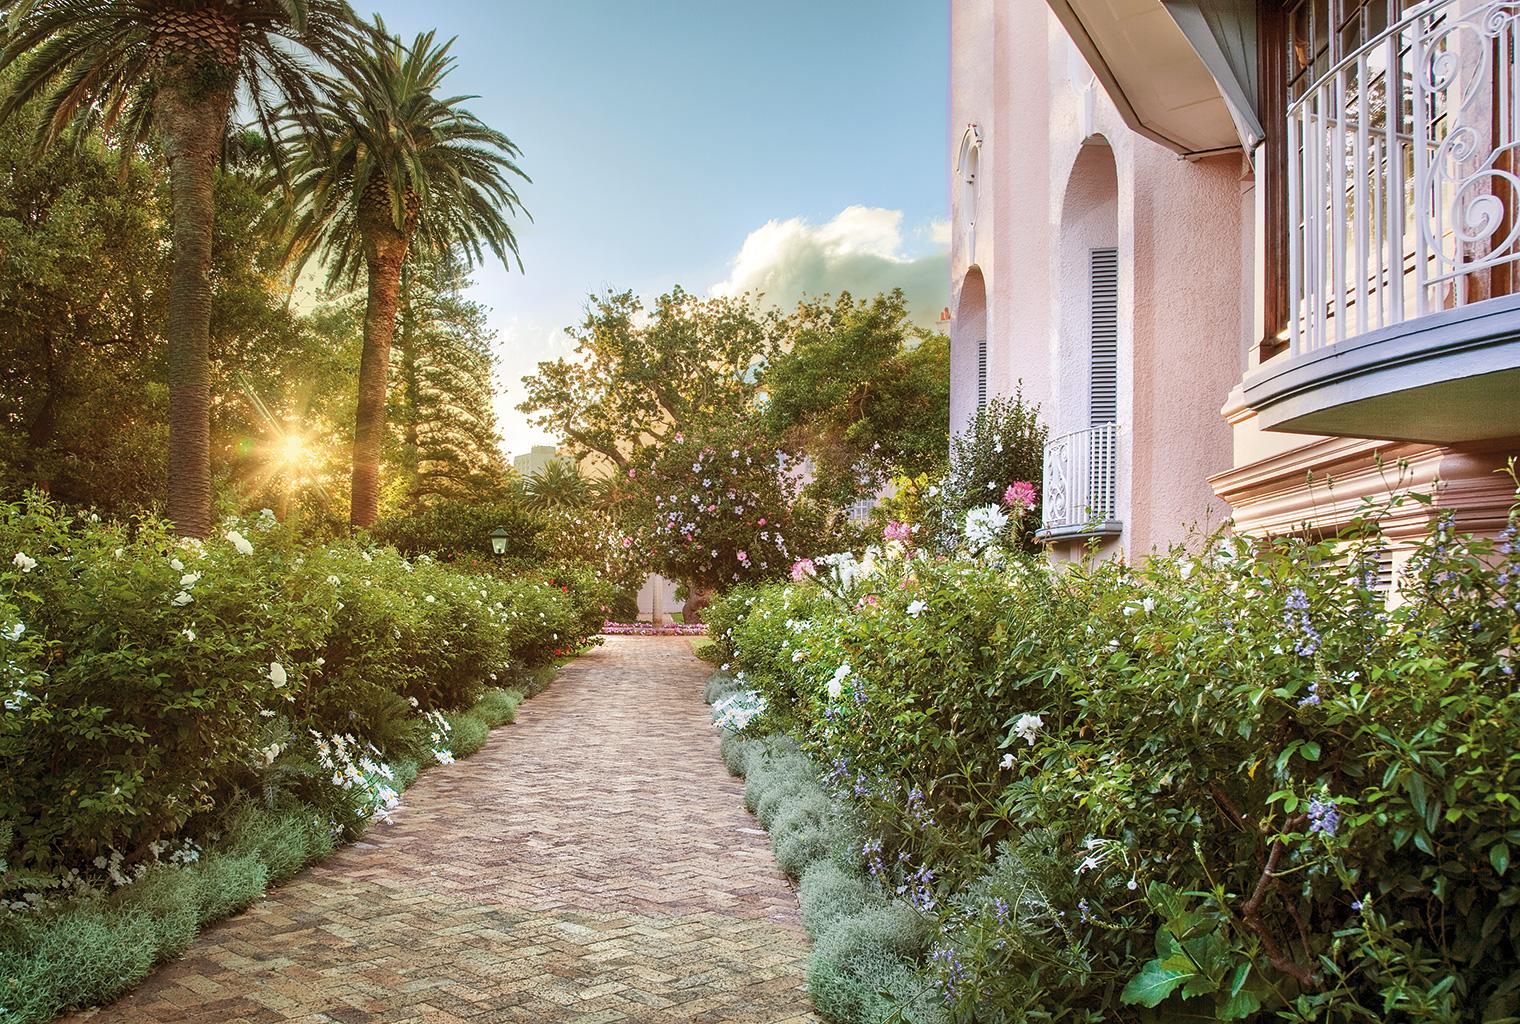 Mount-Nelson-South-Africa-Exterior-Garden